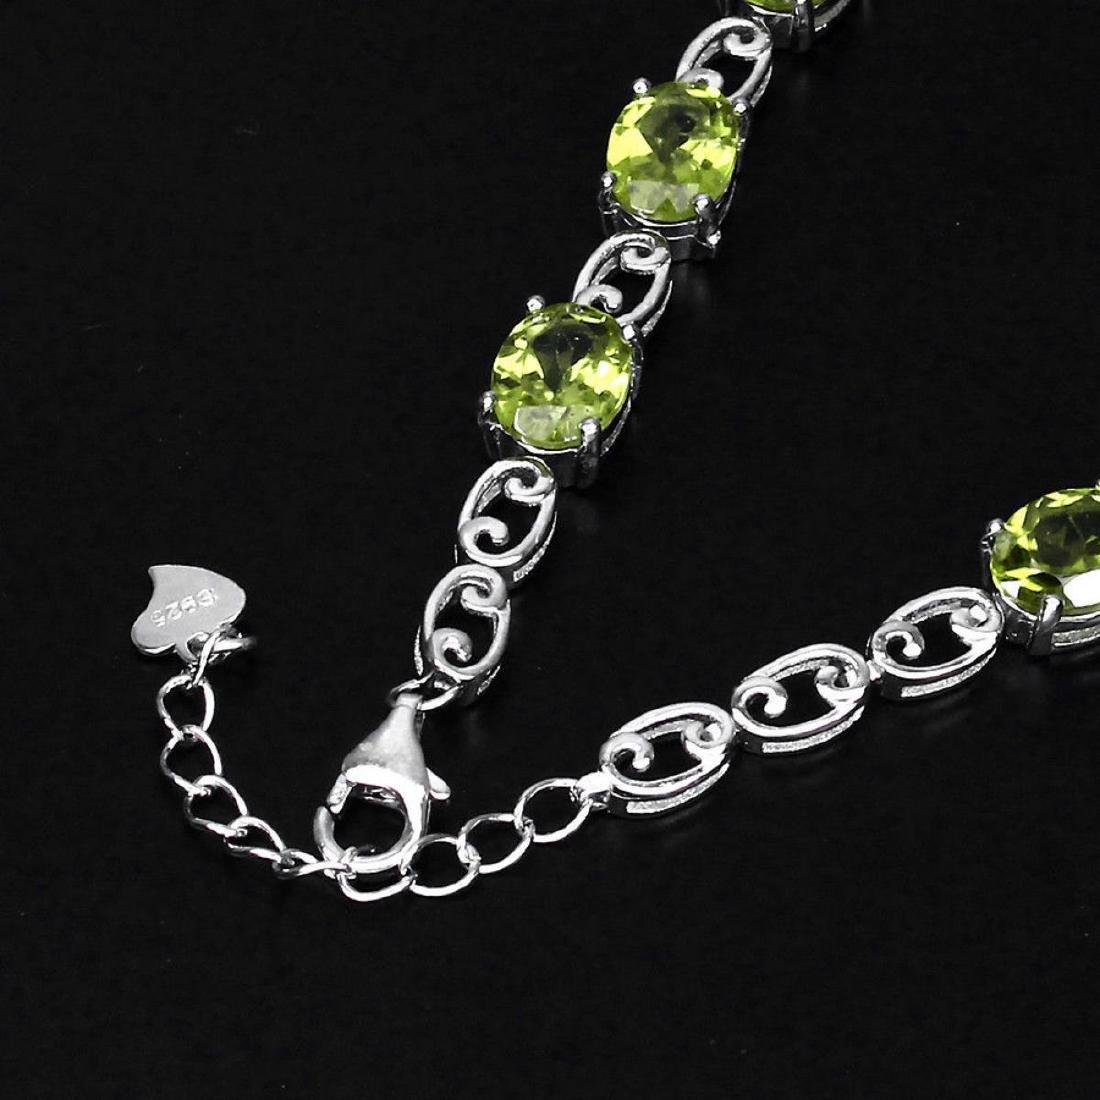 Natural  8x6mm Top Rich Green Peridot Bracelet - 3